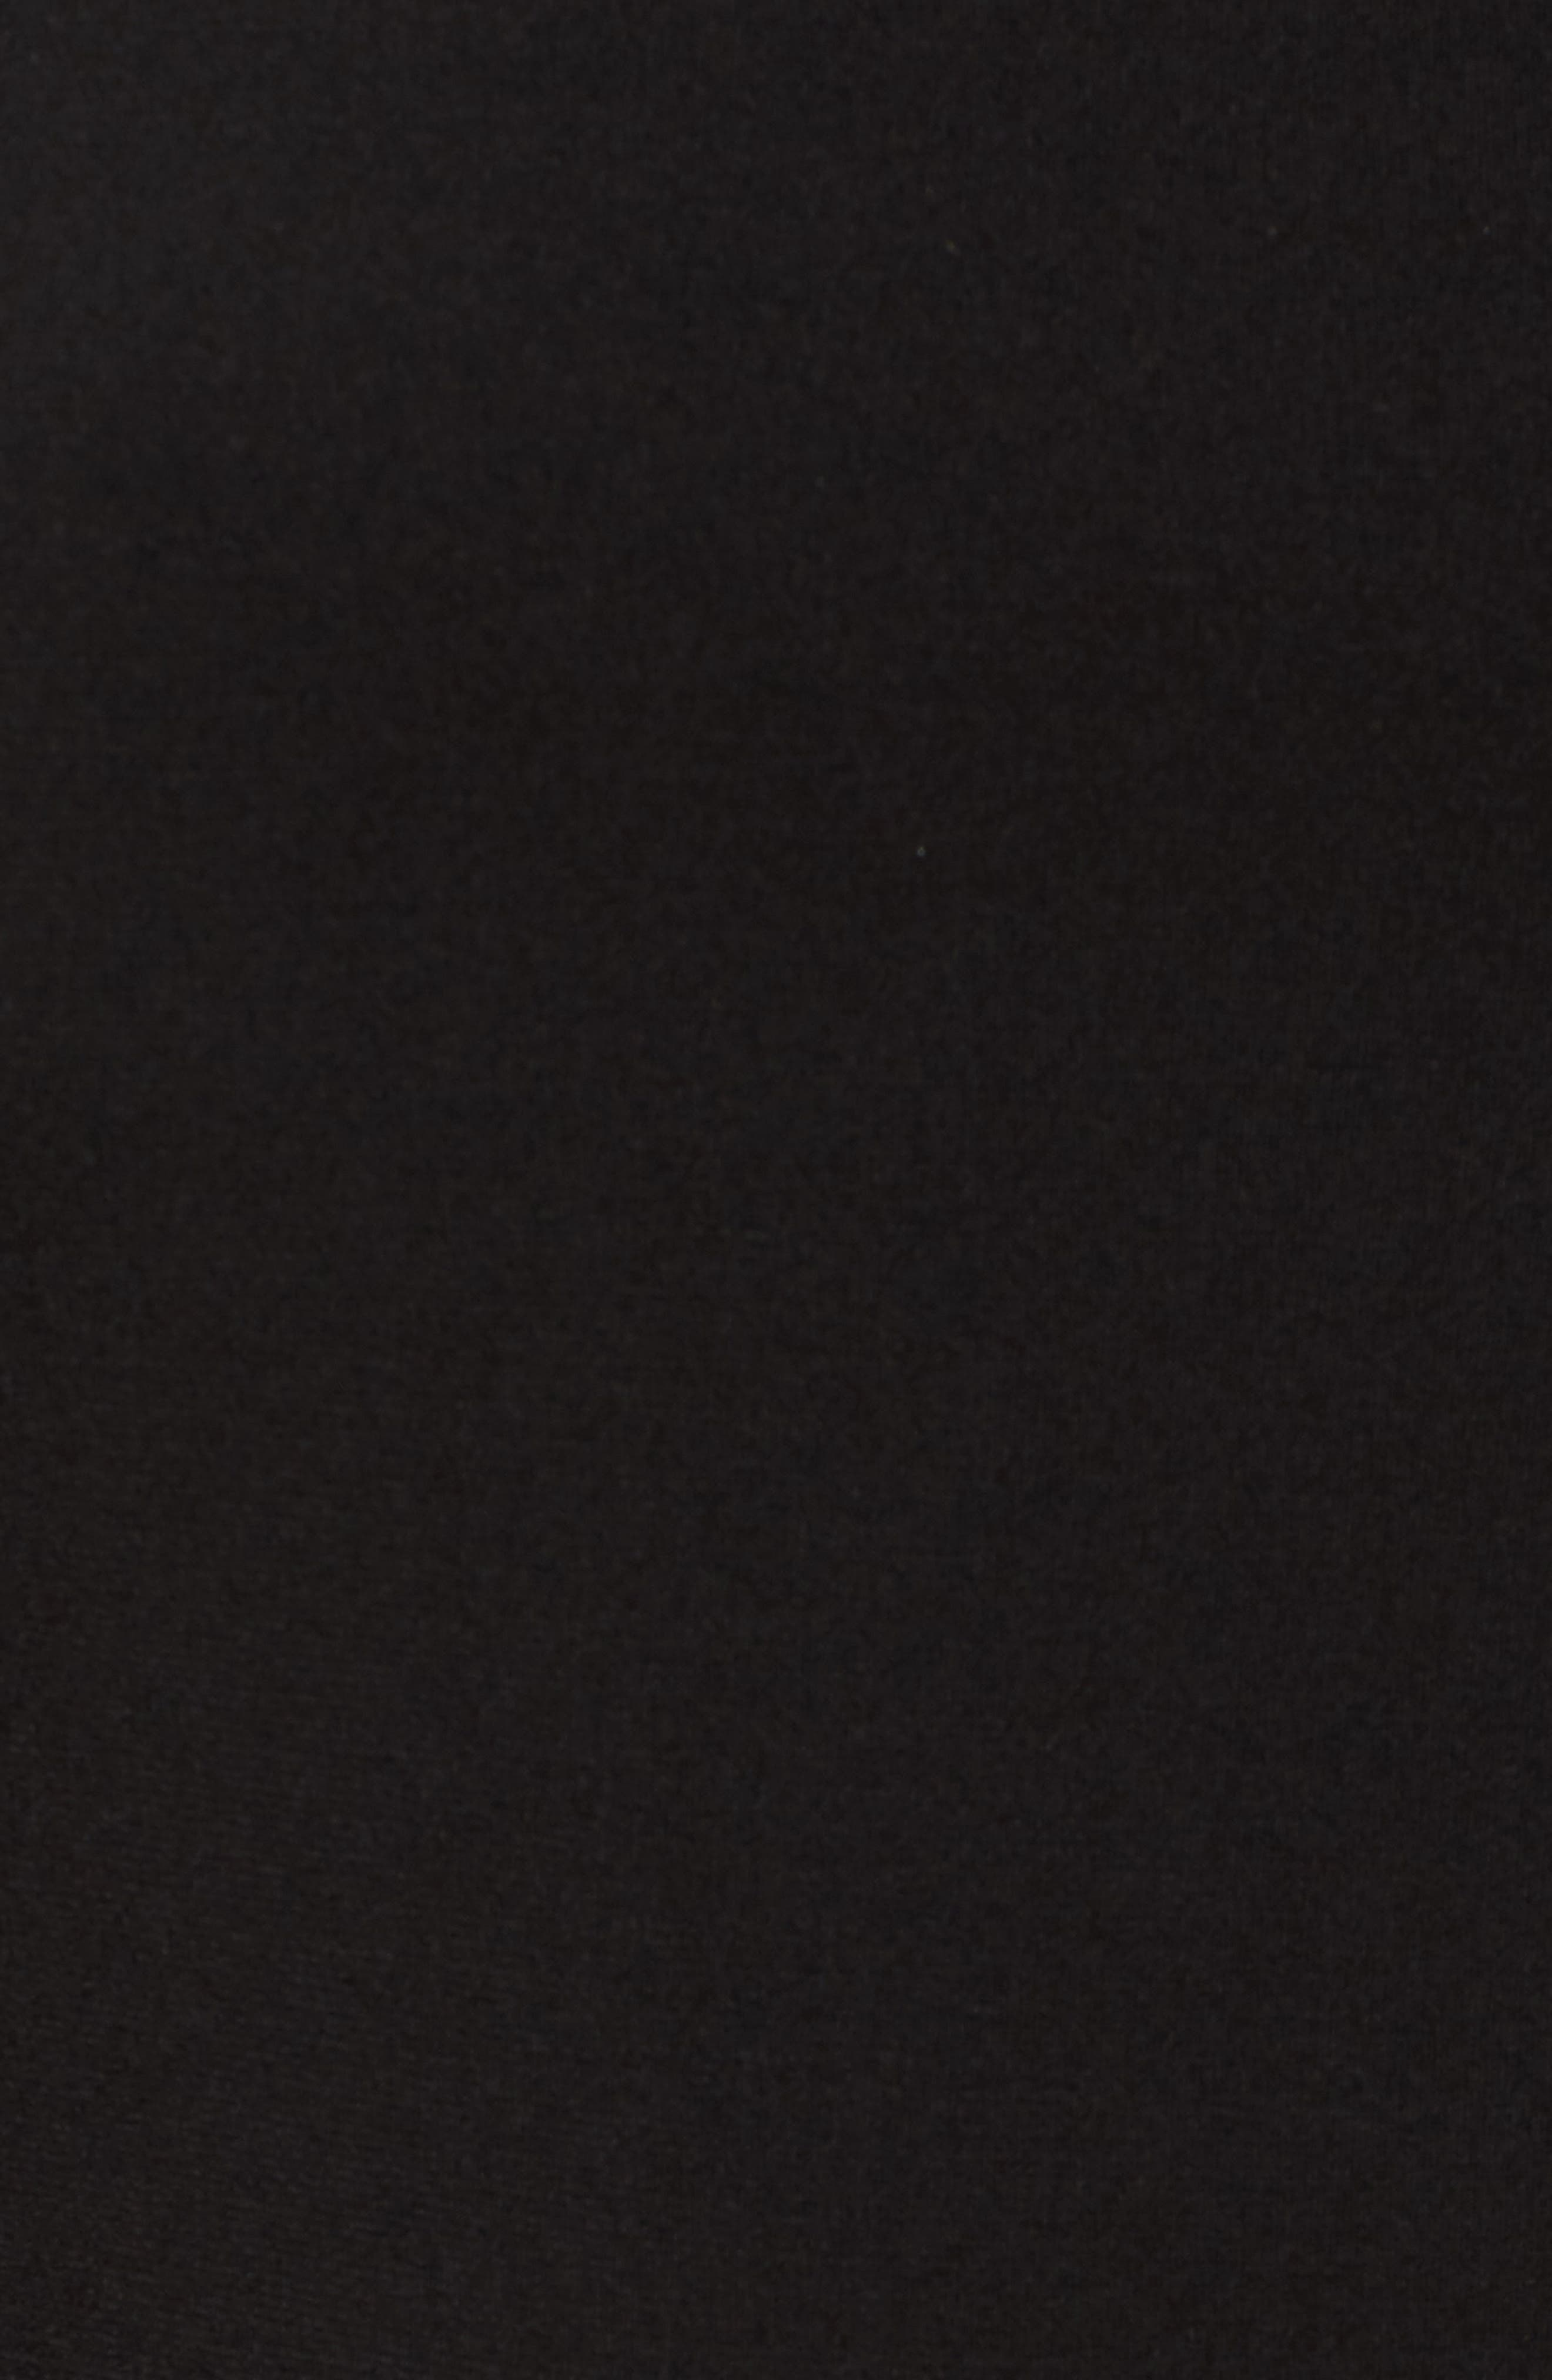 Grommet Mock Neck Knit Dress,                             Alternate thumbnail 5, color,                             001